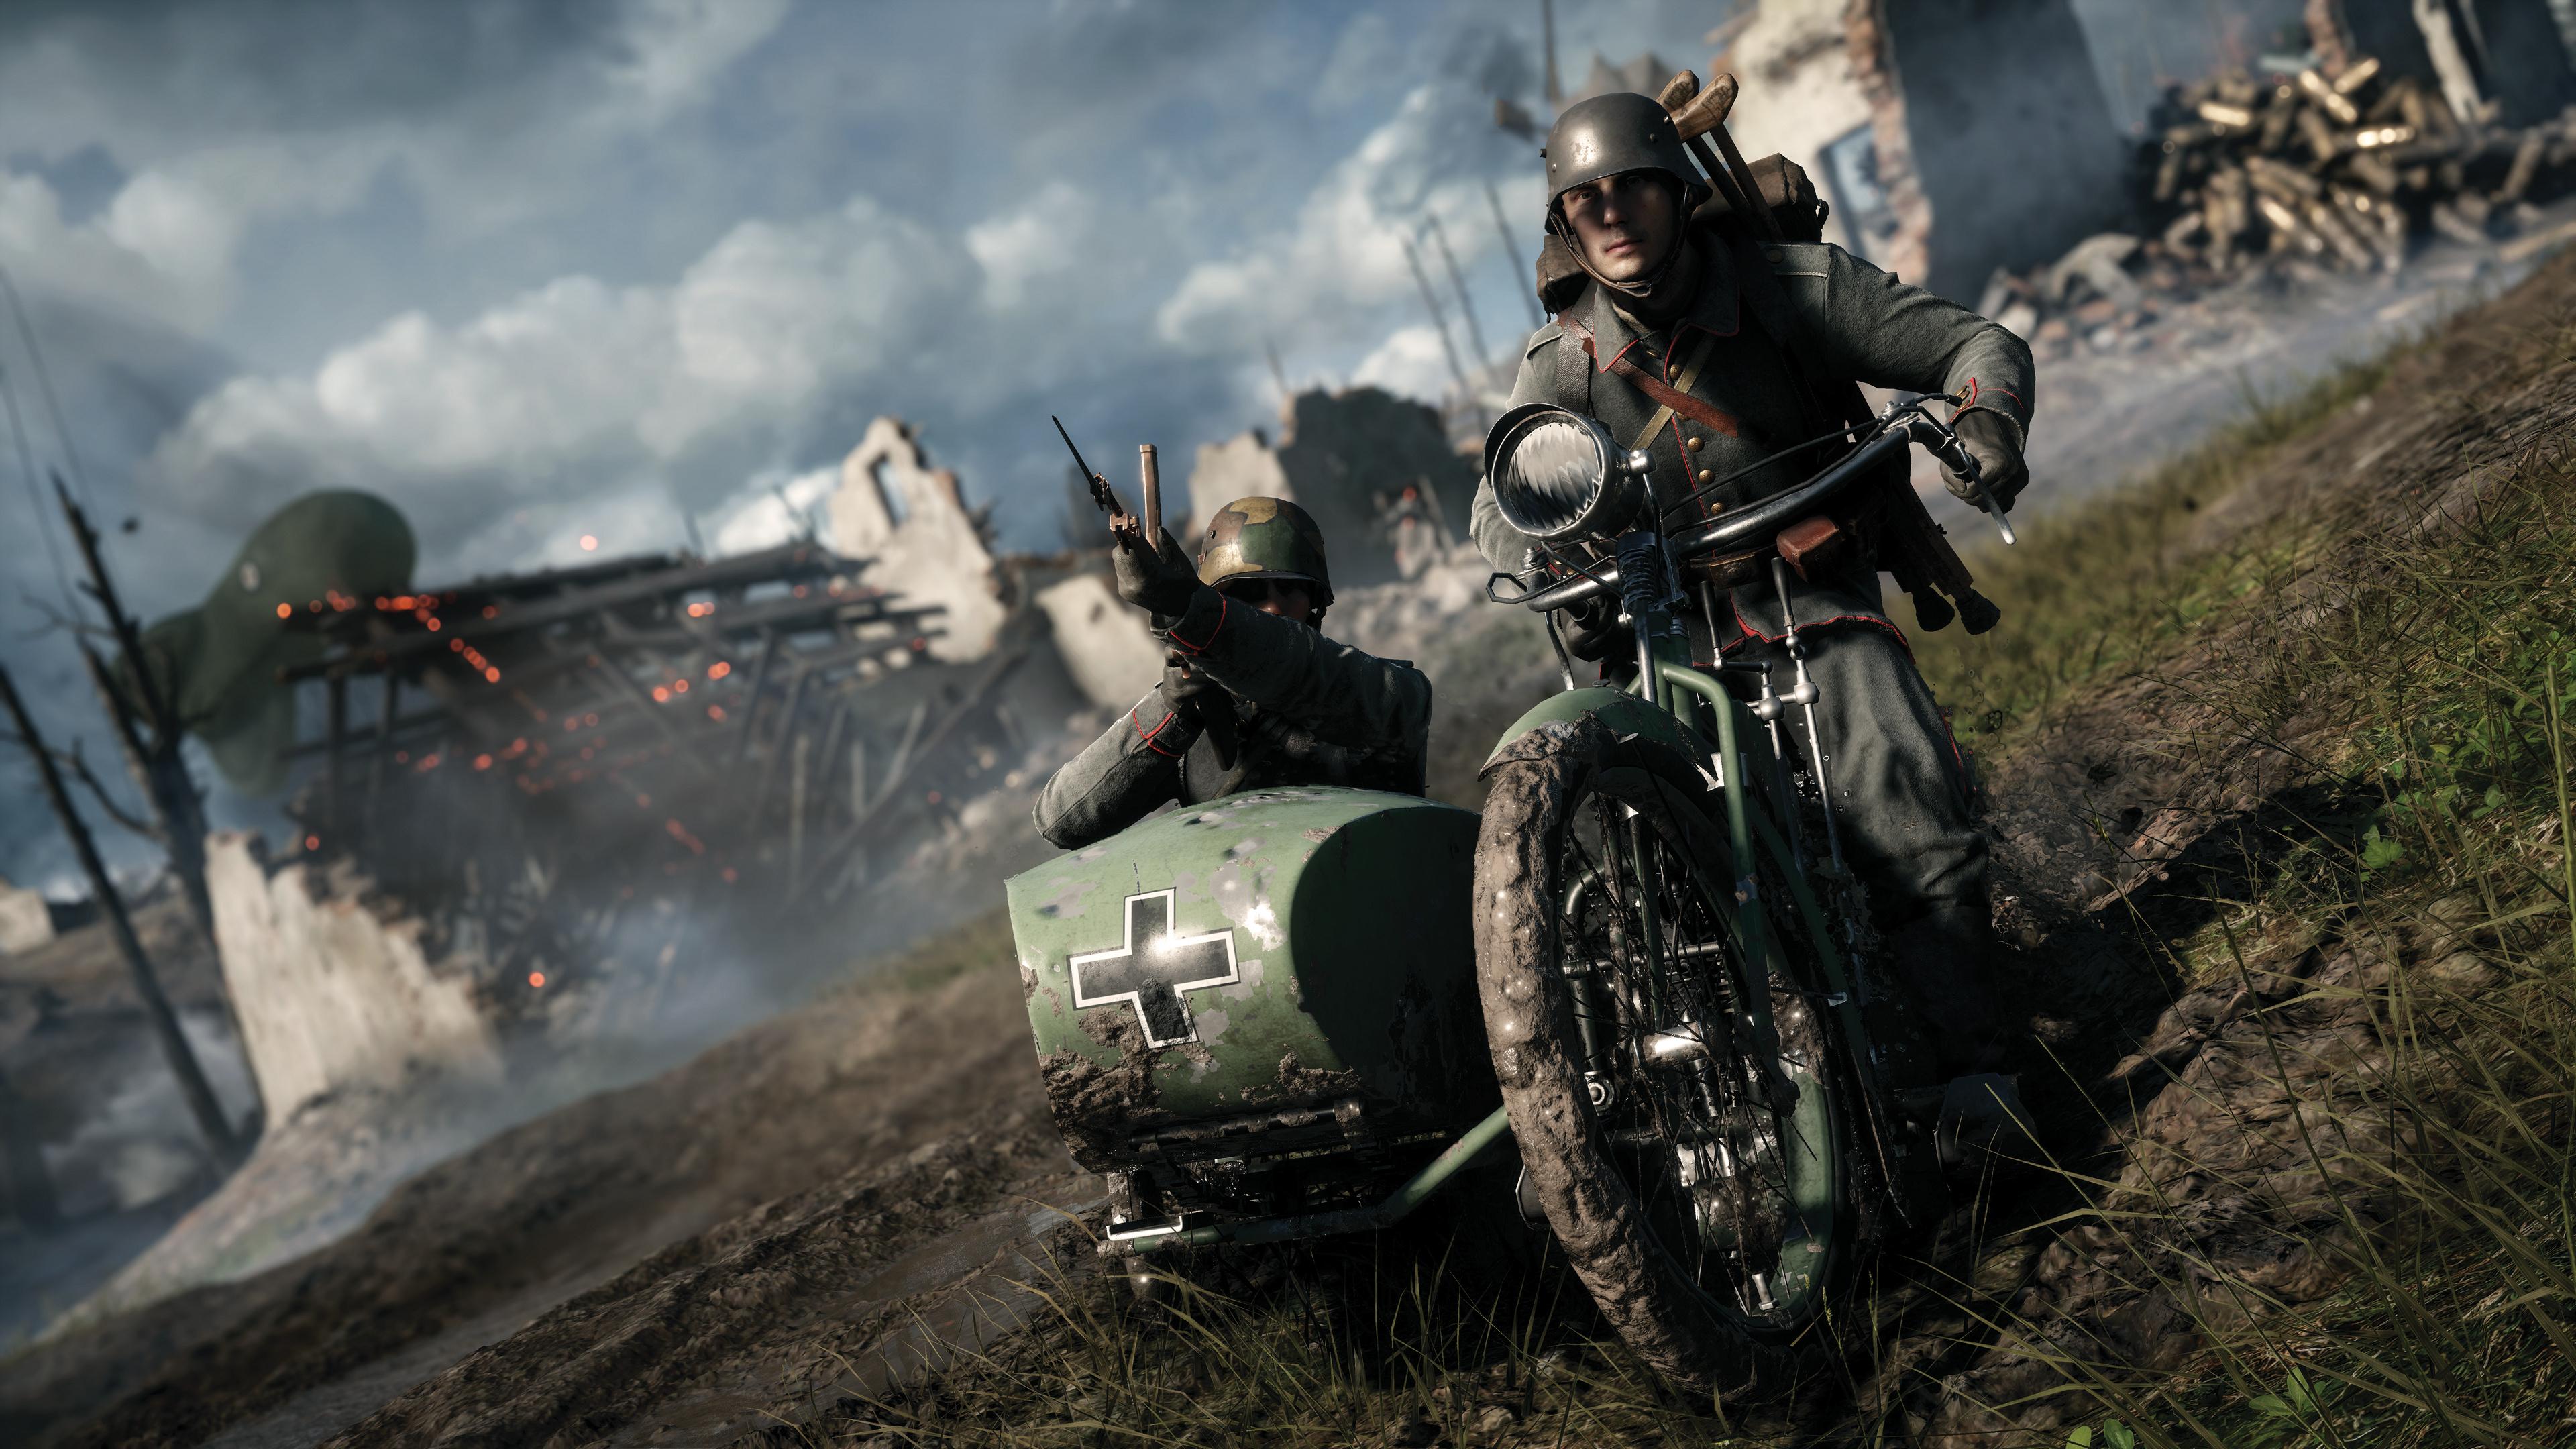 Battlefield 1 wallpapers or desktop backgrounds